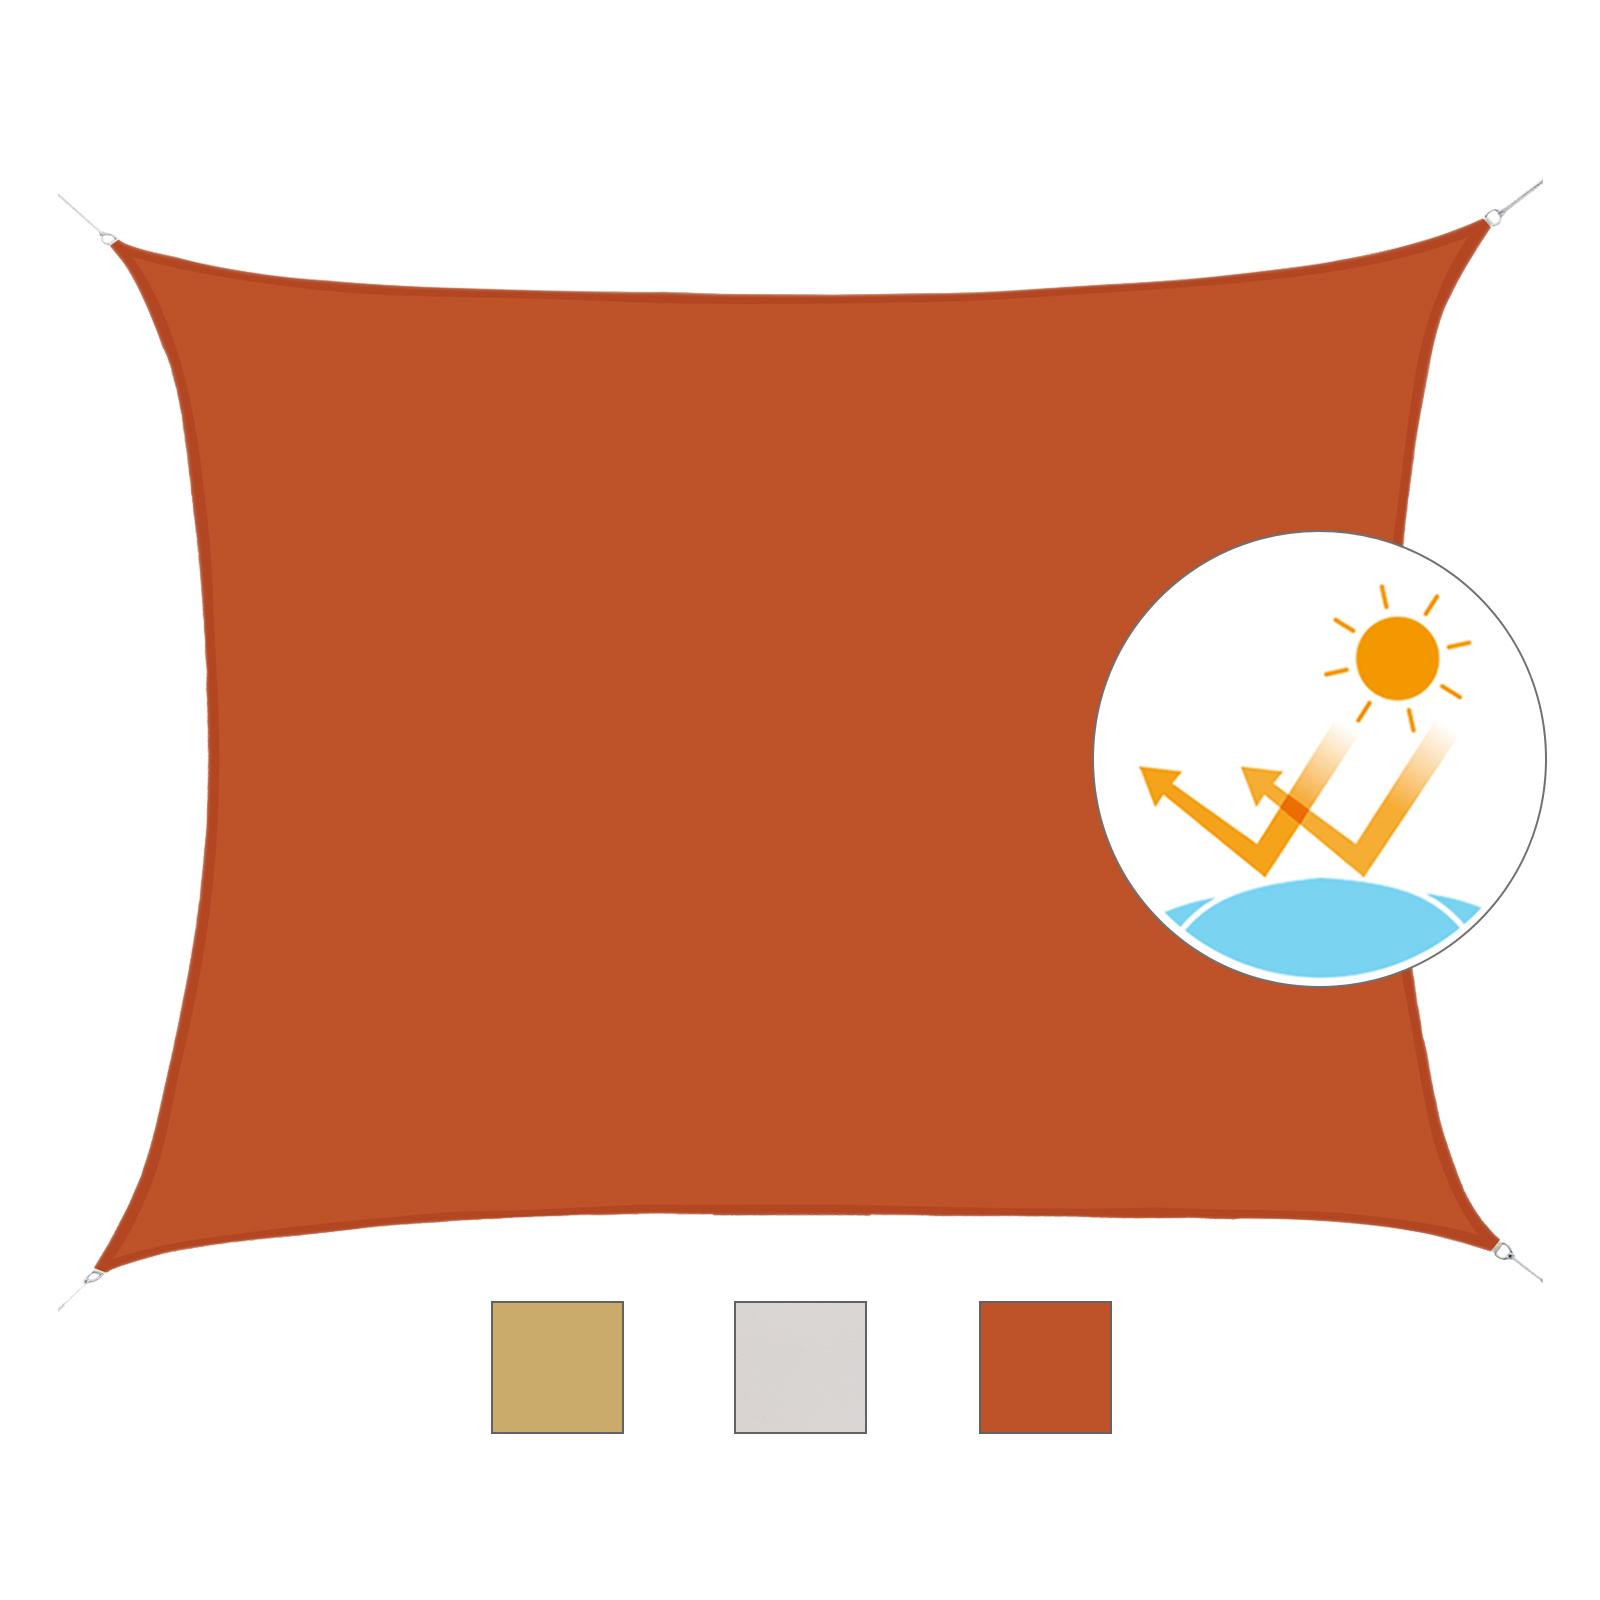 Toldo-de-Vela-Rectangular-para-Jardin-y-Exterior-Repelente-al-Agua-Proteccion-UV miniatura 21